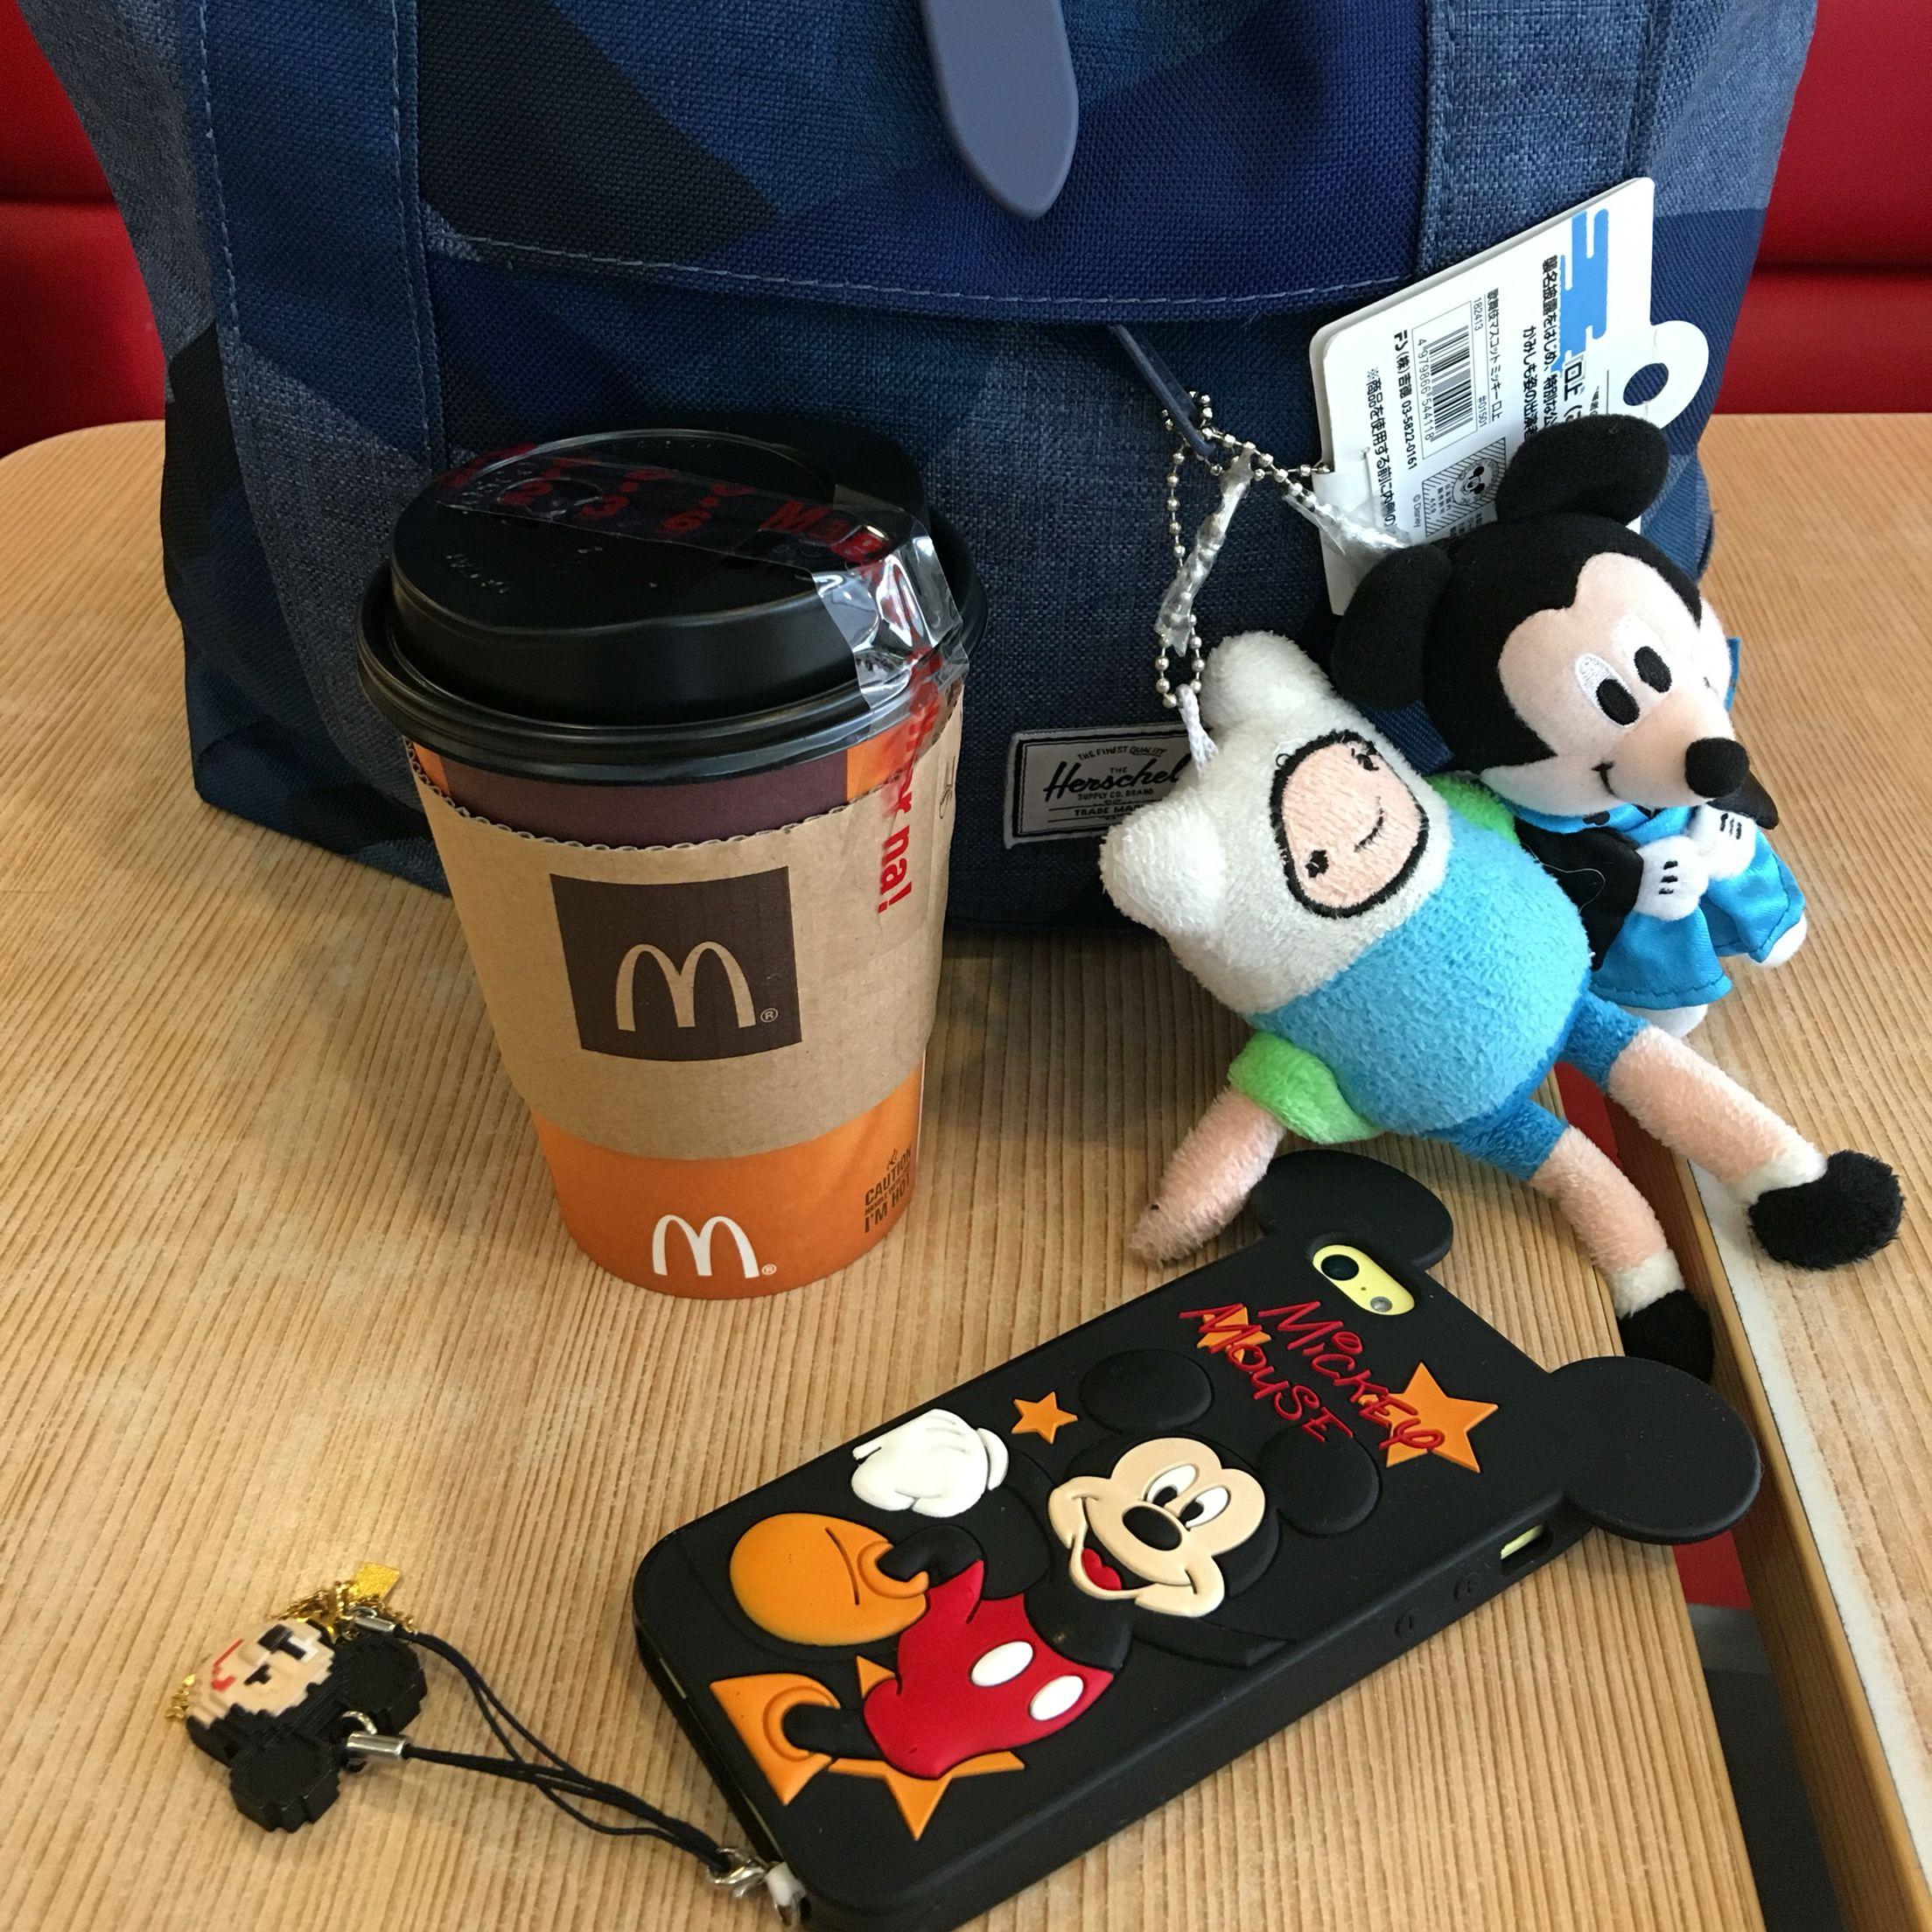 McDonald's Coffee love, Pokemon, Mickey mouse